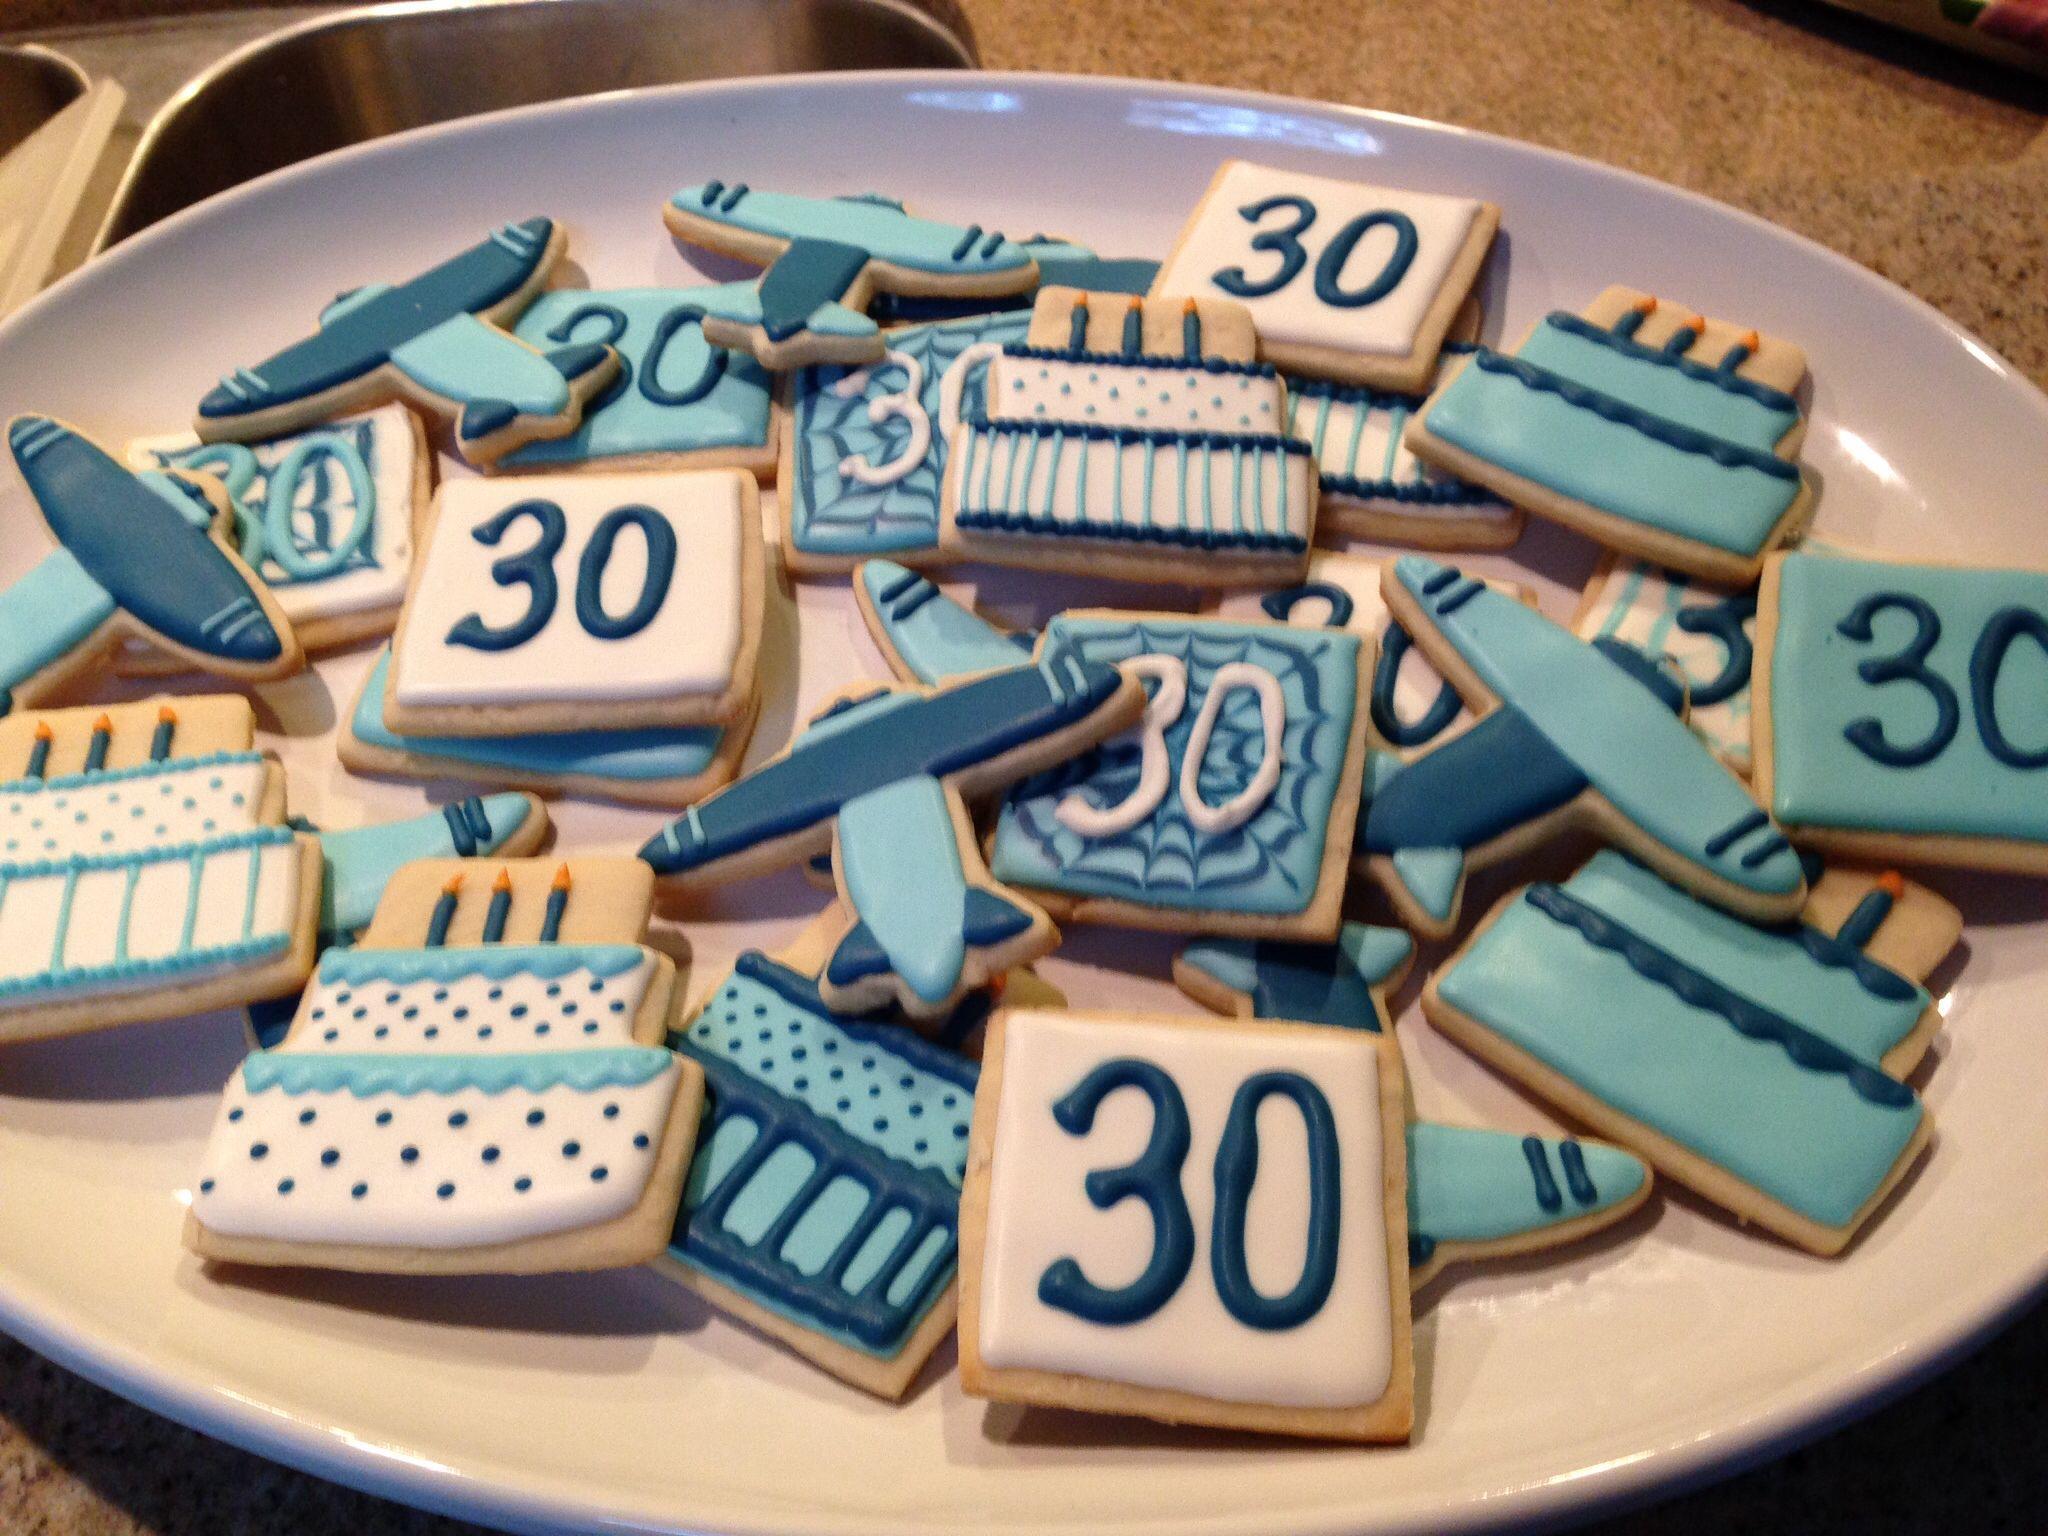 30th birthday airplane cookies sugar cookies decorated